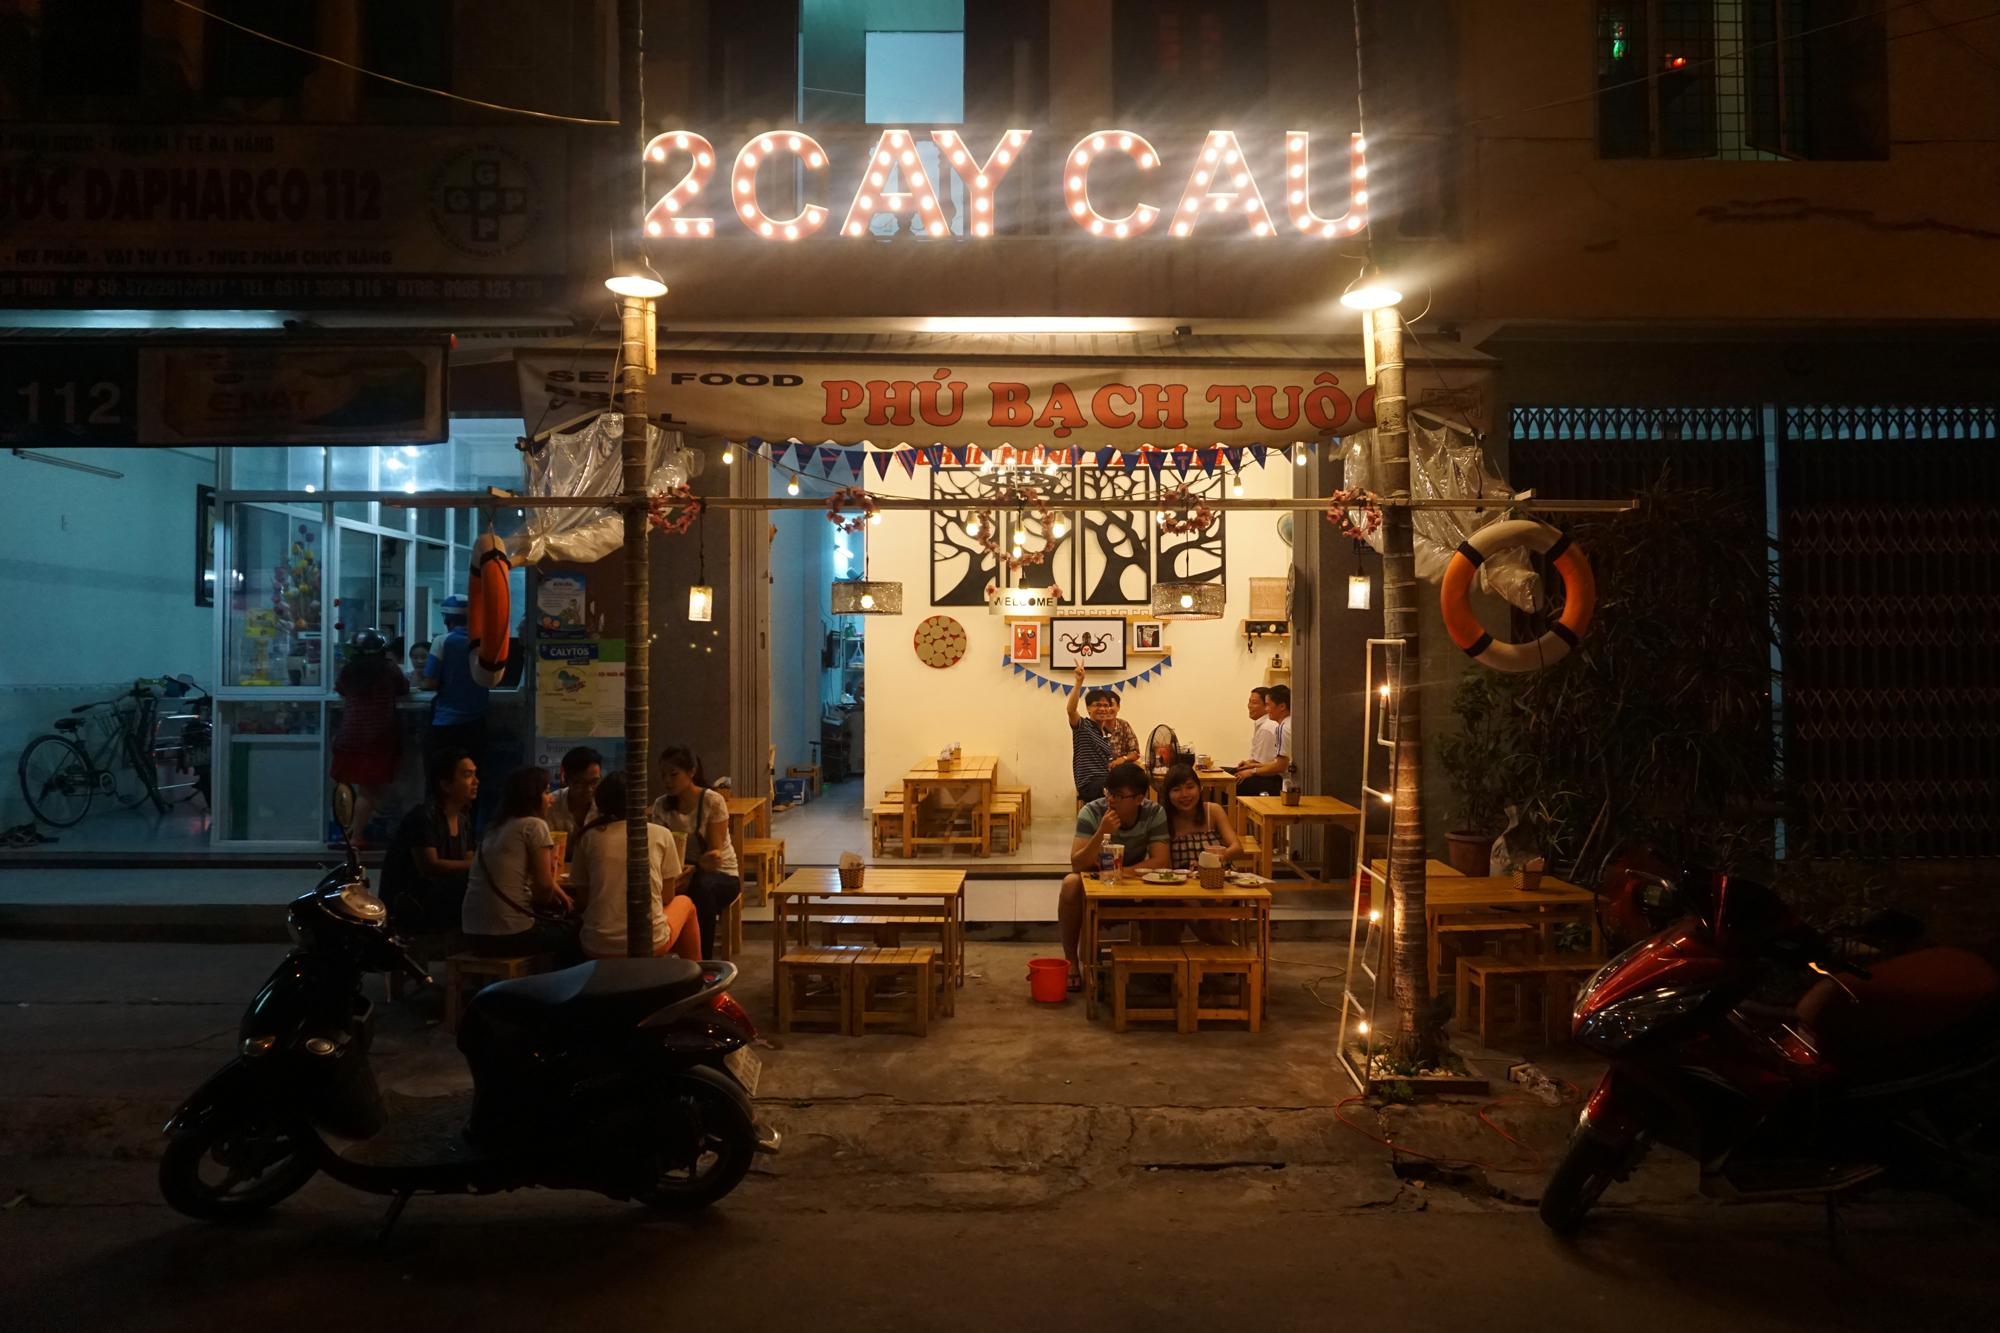 Saying hi to locals, Da Nang